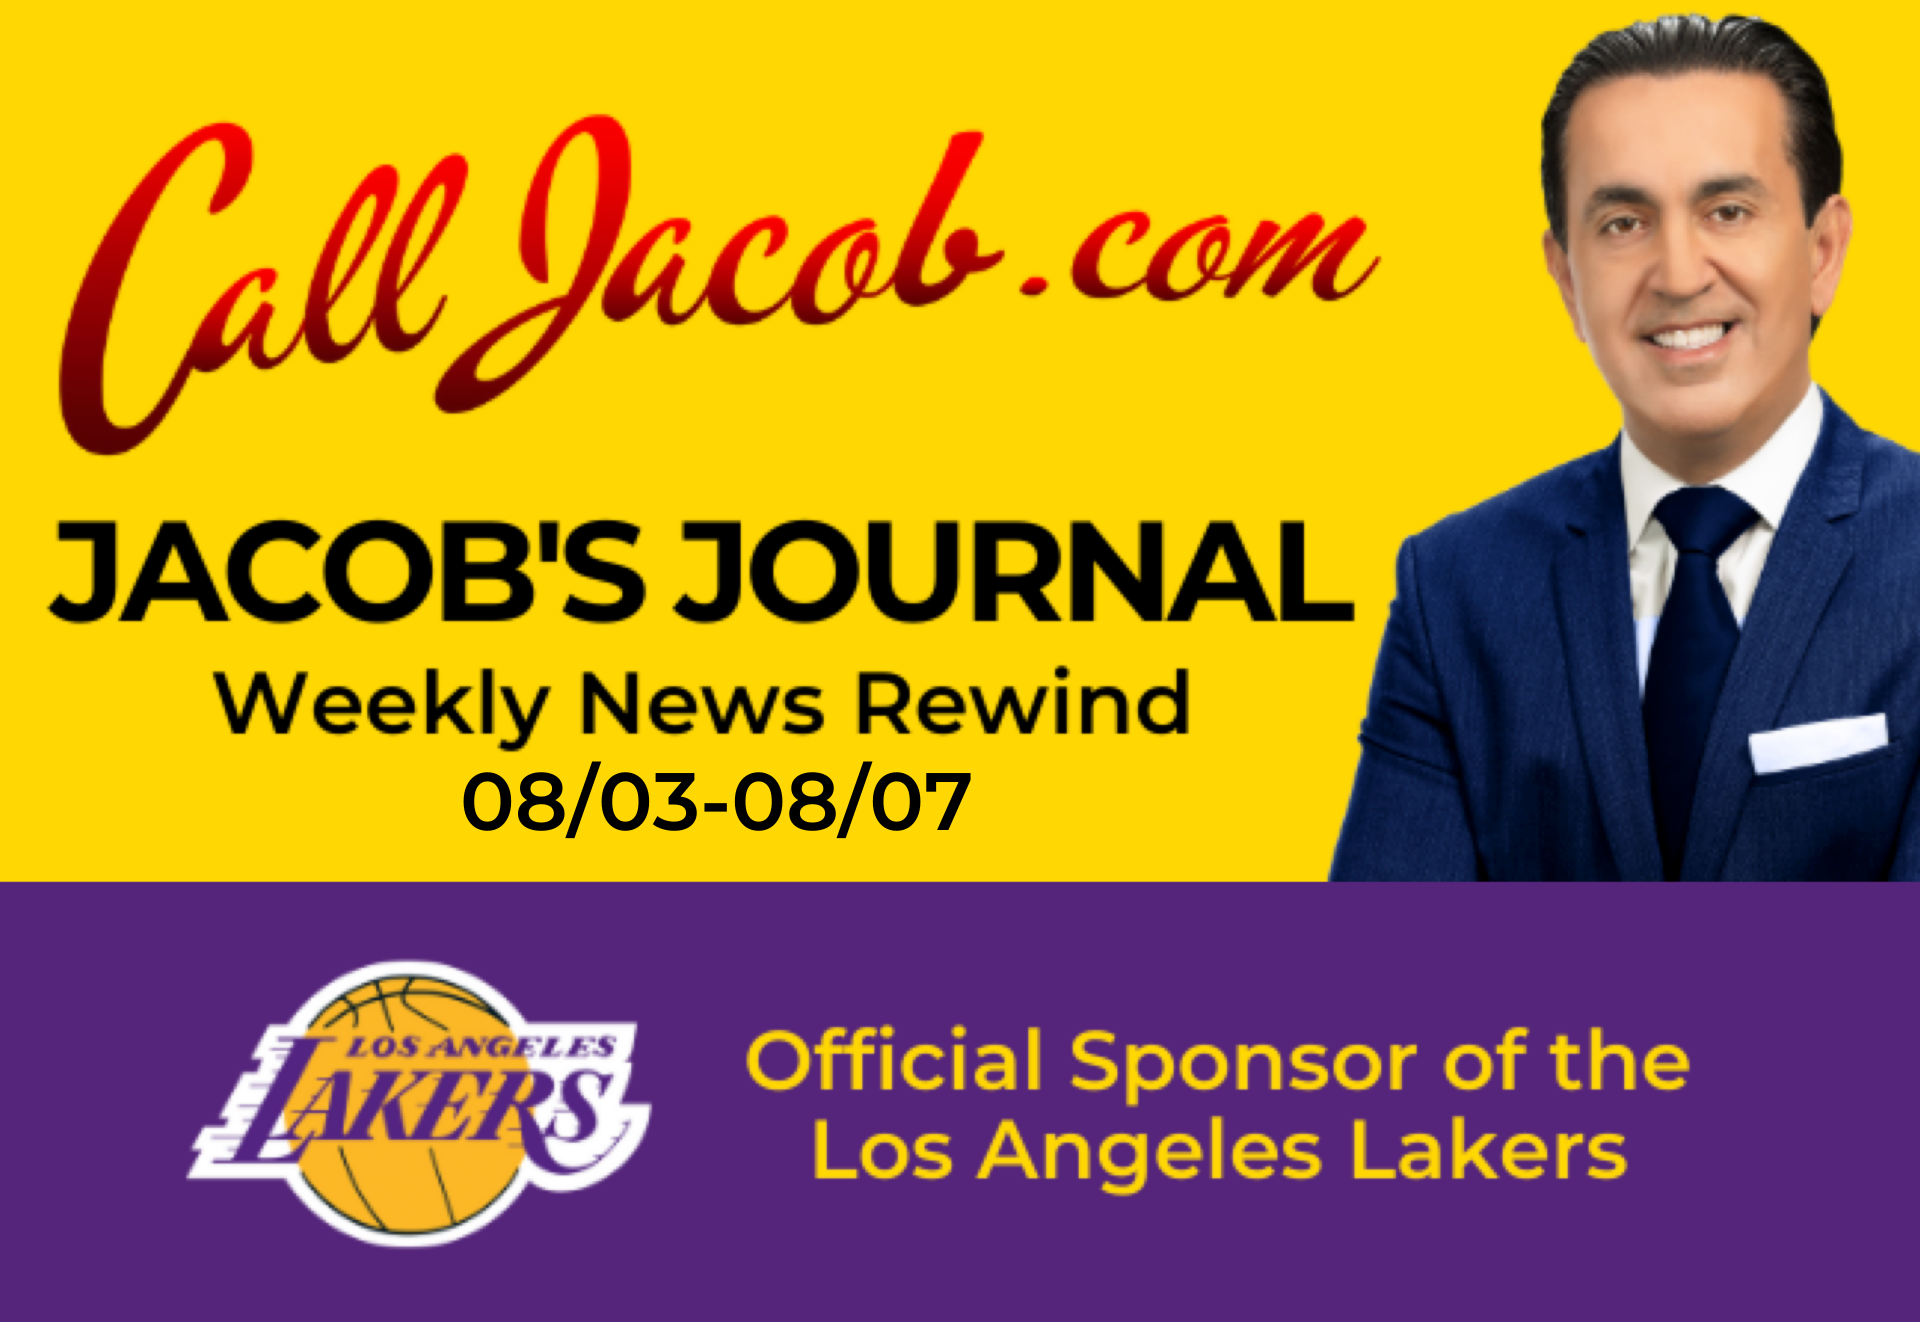 JacobsJournalWeeklyNewsRewind-08_03-08_07